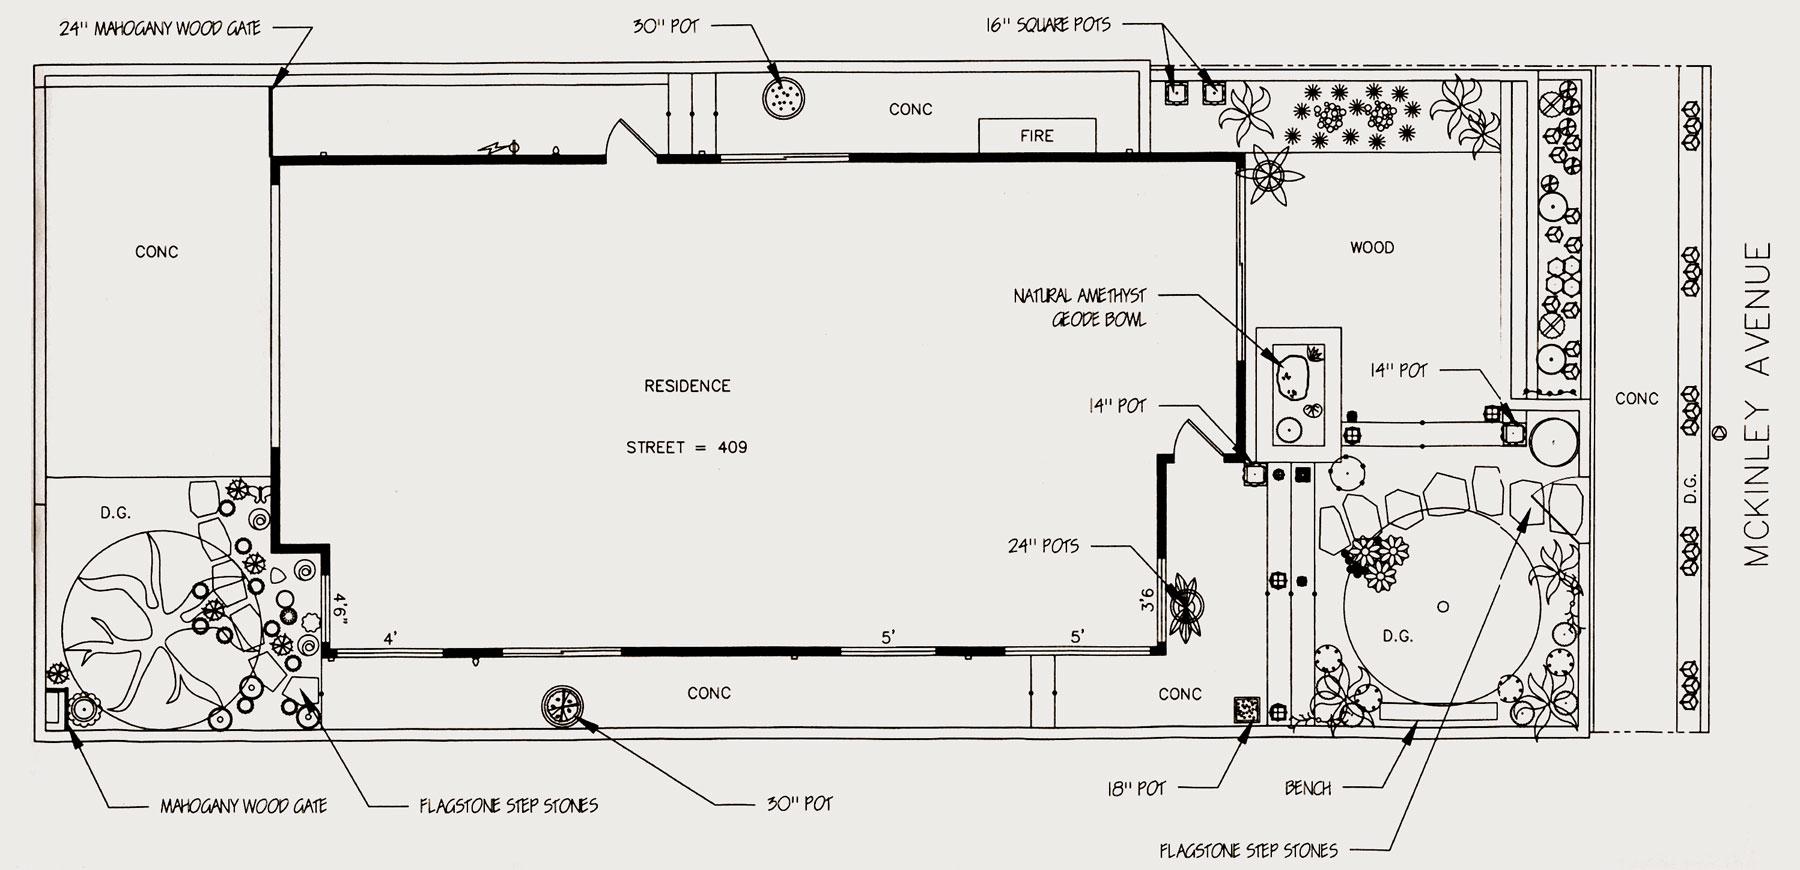 Exterior design sketch - street level